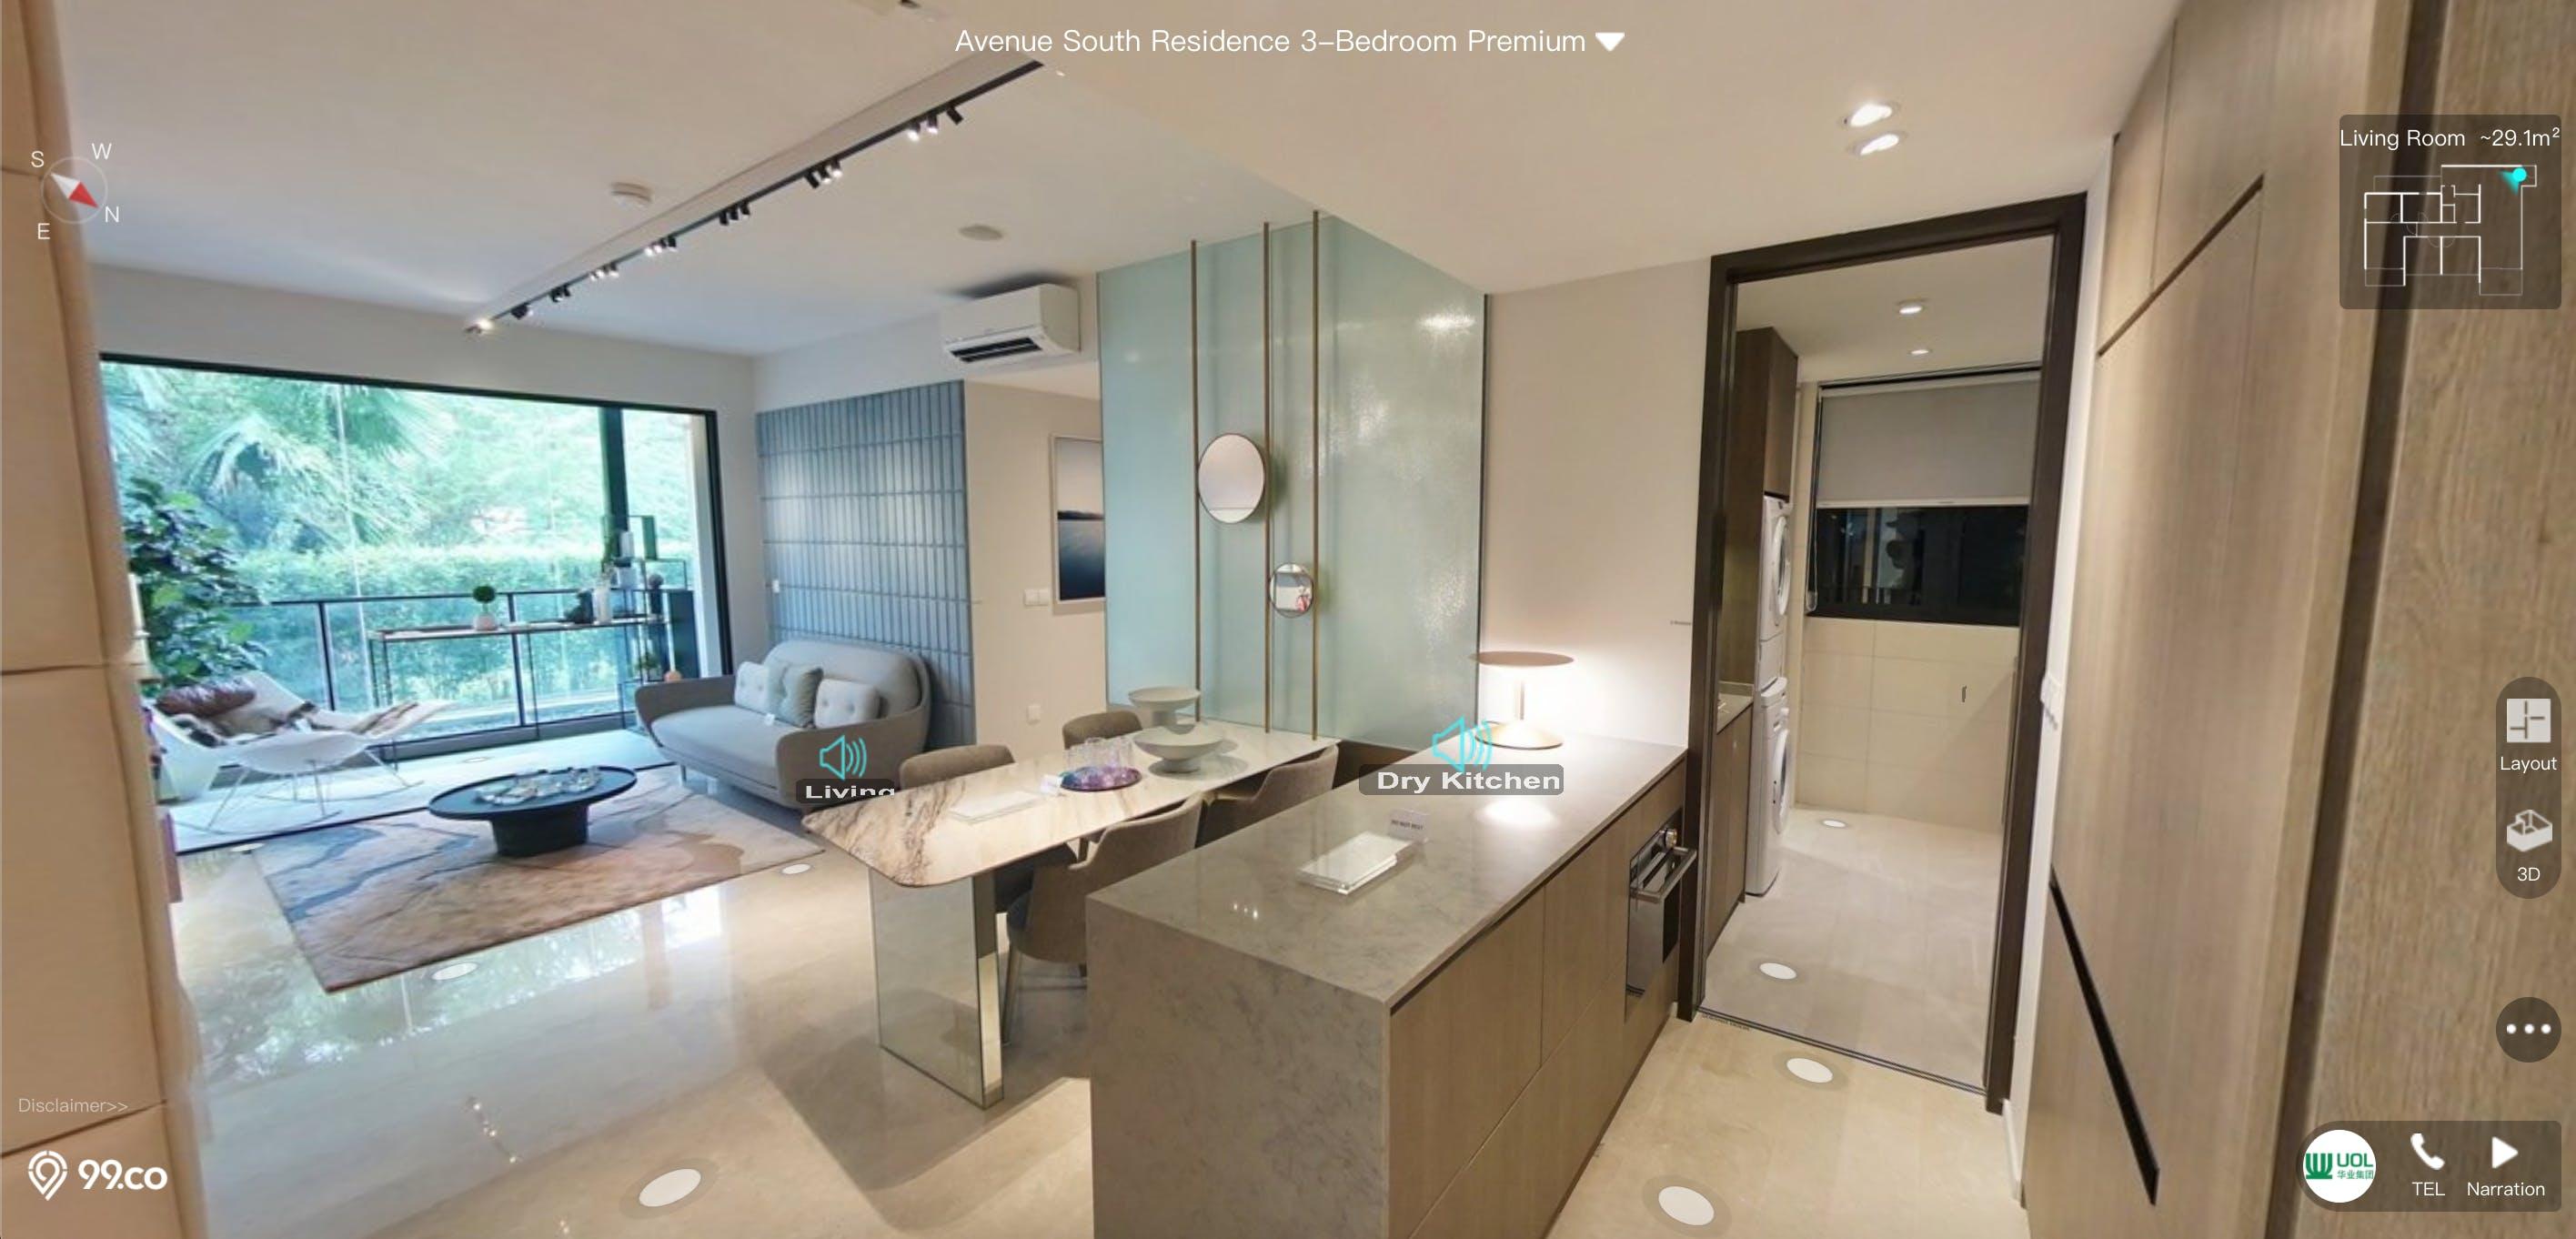 Avenue South Residence 3 Bedroom Premium